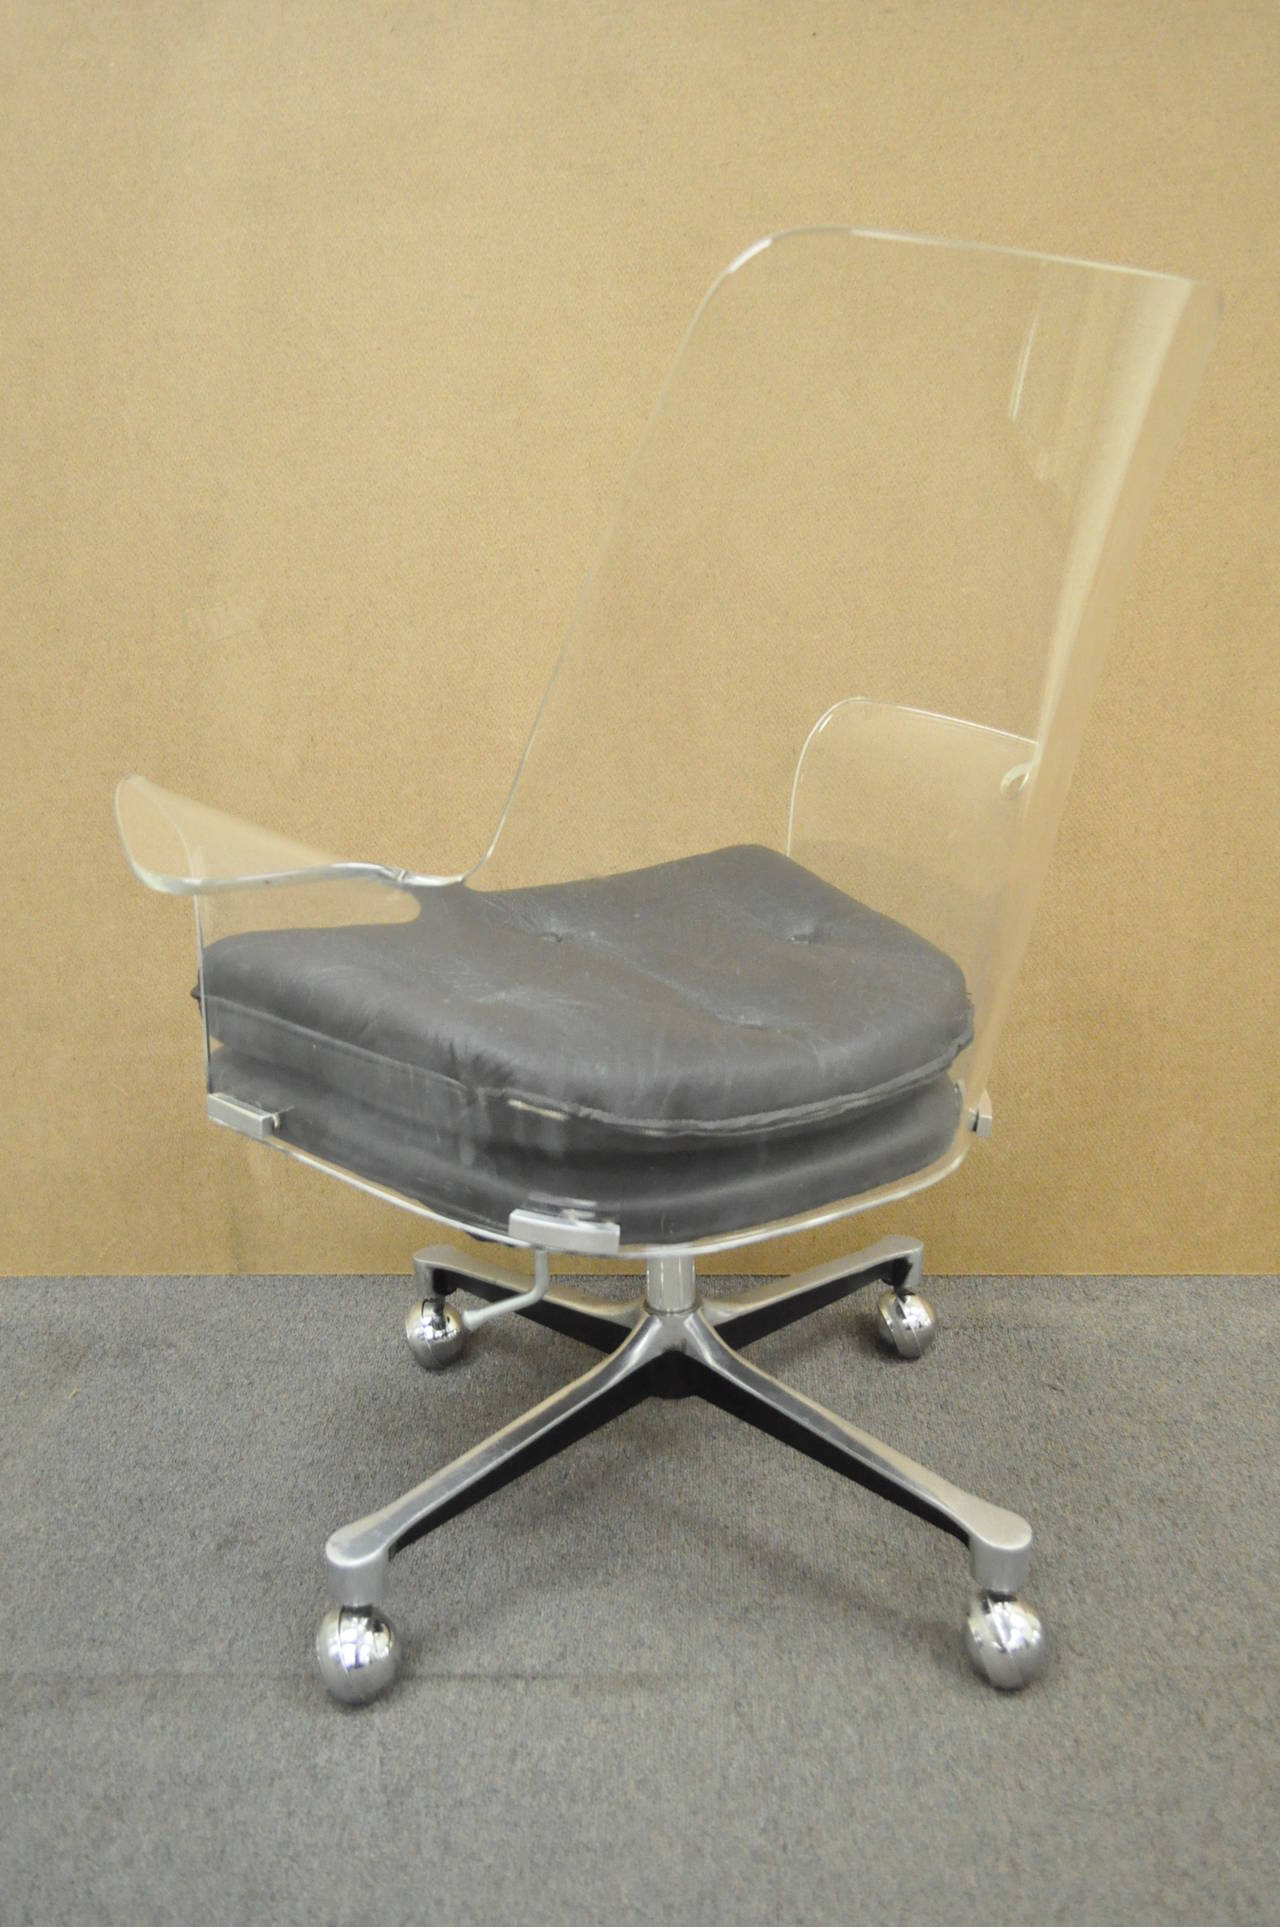 1960s Sculpted Lucite Swivel Desk Chair after Vladimir